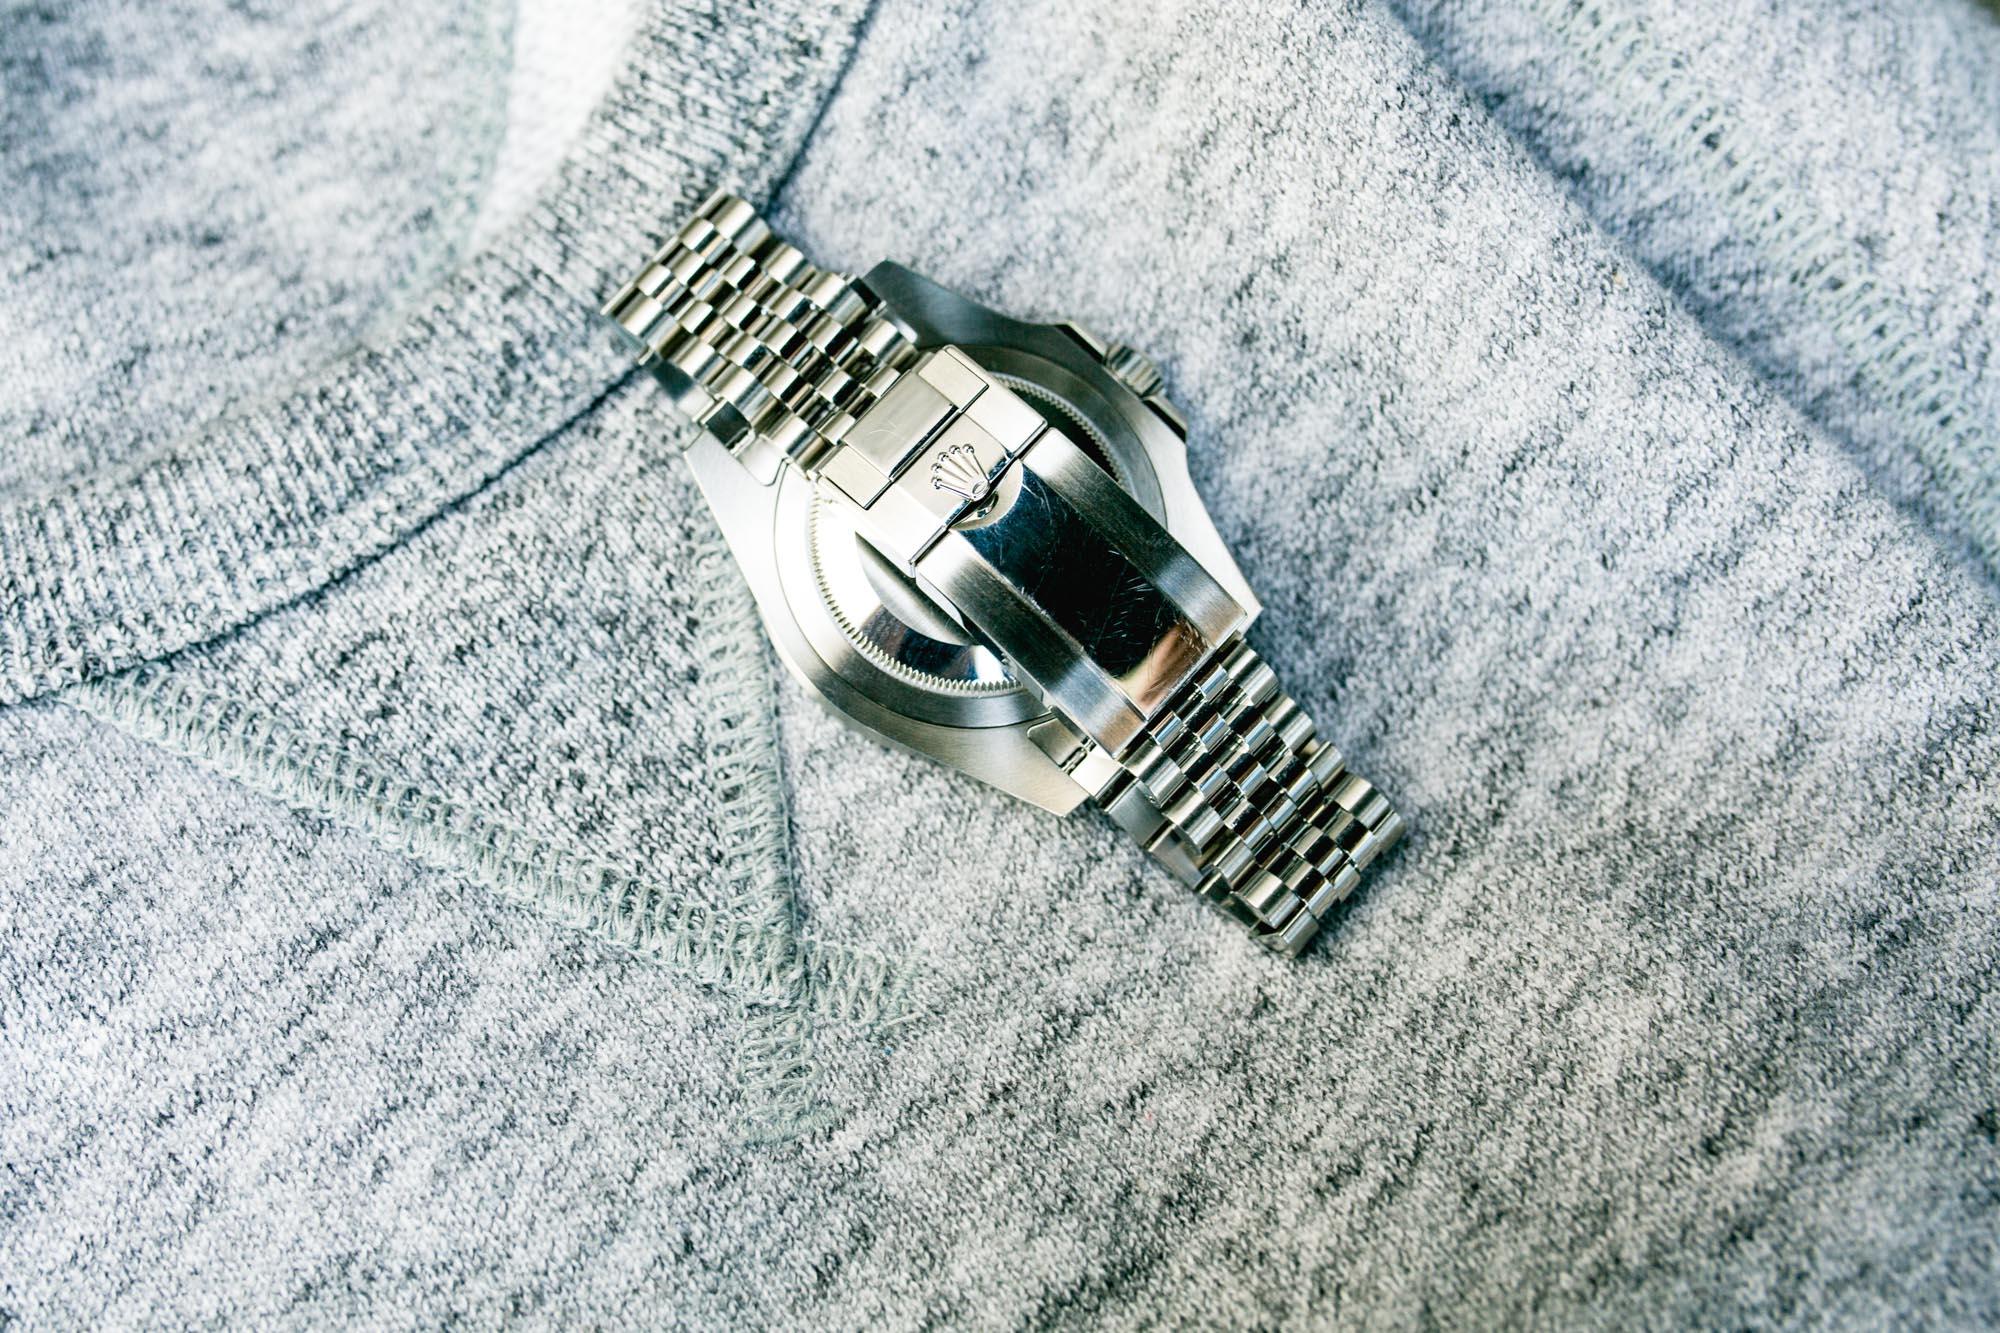 Rolex GMT-Master II Ref 126710BLRO - Boucle